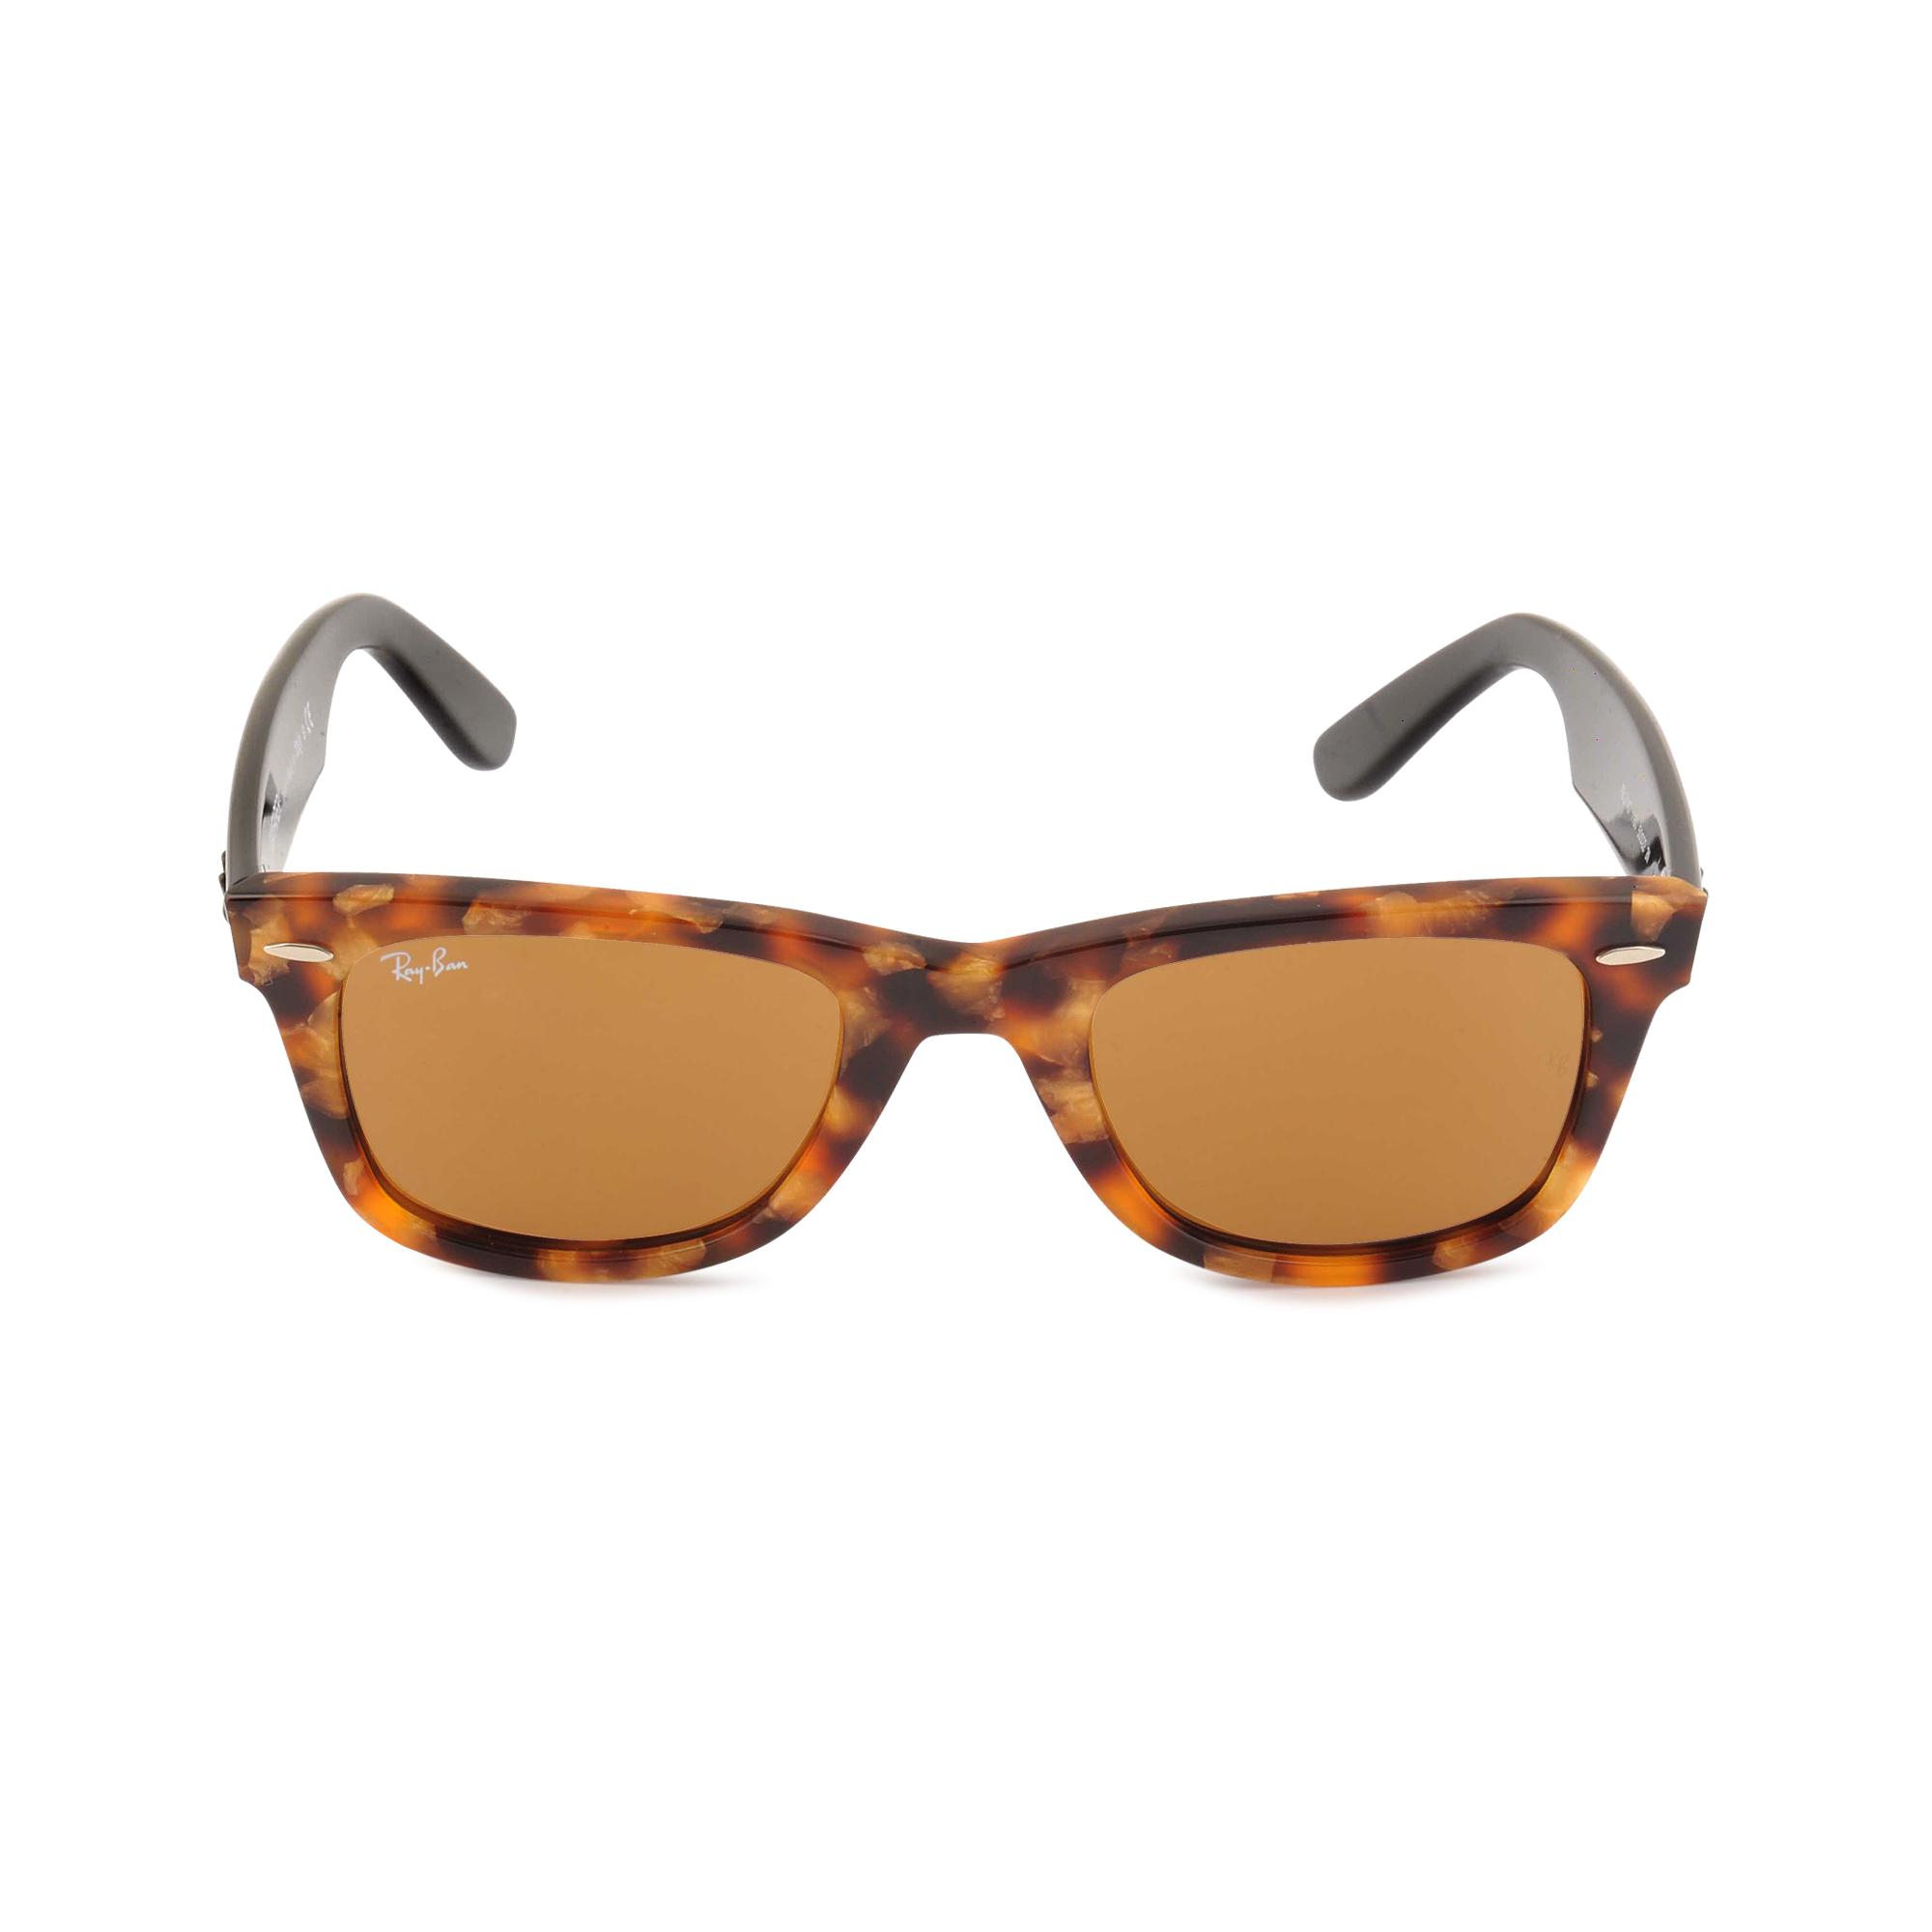 ray ban original wayfarer 2140 sunglasses in brown lyst. Black Bedroom Furniture Sets. Home Design Ideas